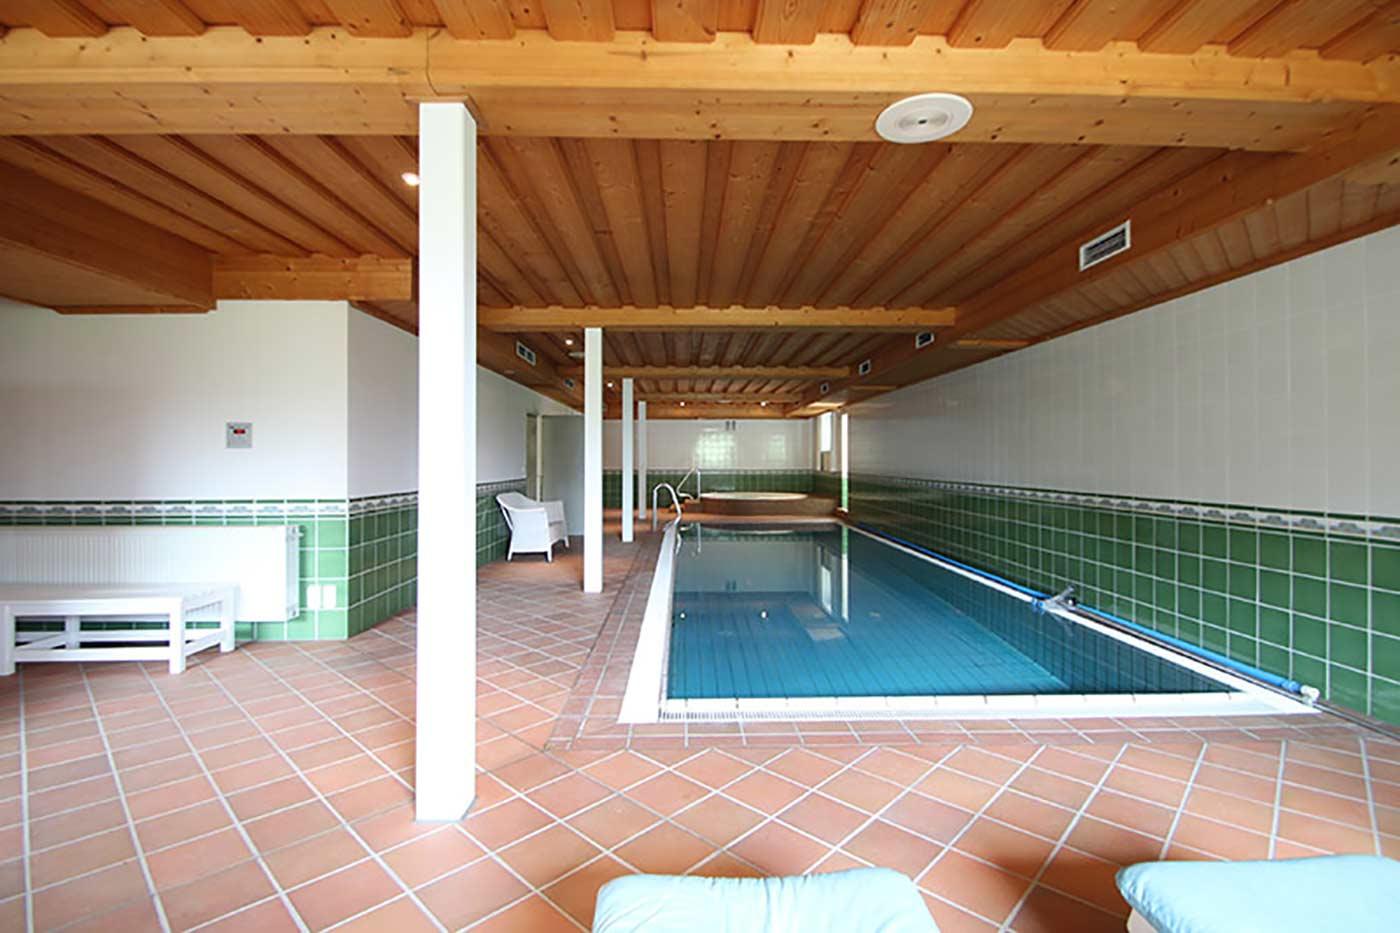 Vorher-Foto vom Schwimmbad und Pool | Blickfang Homestaging in Soest